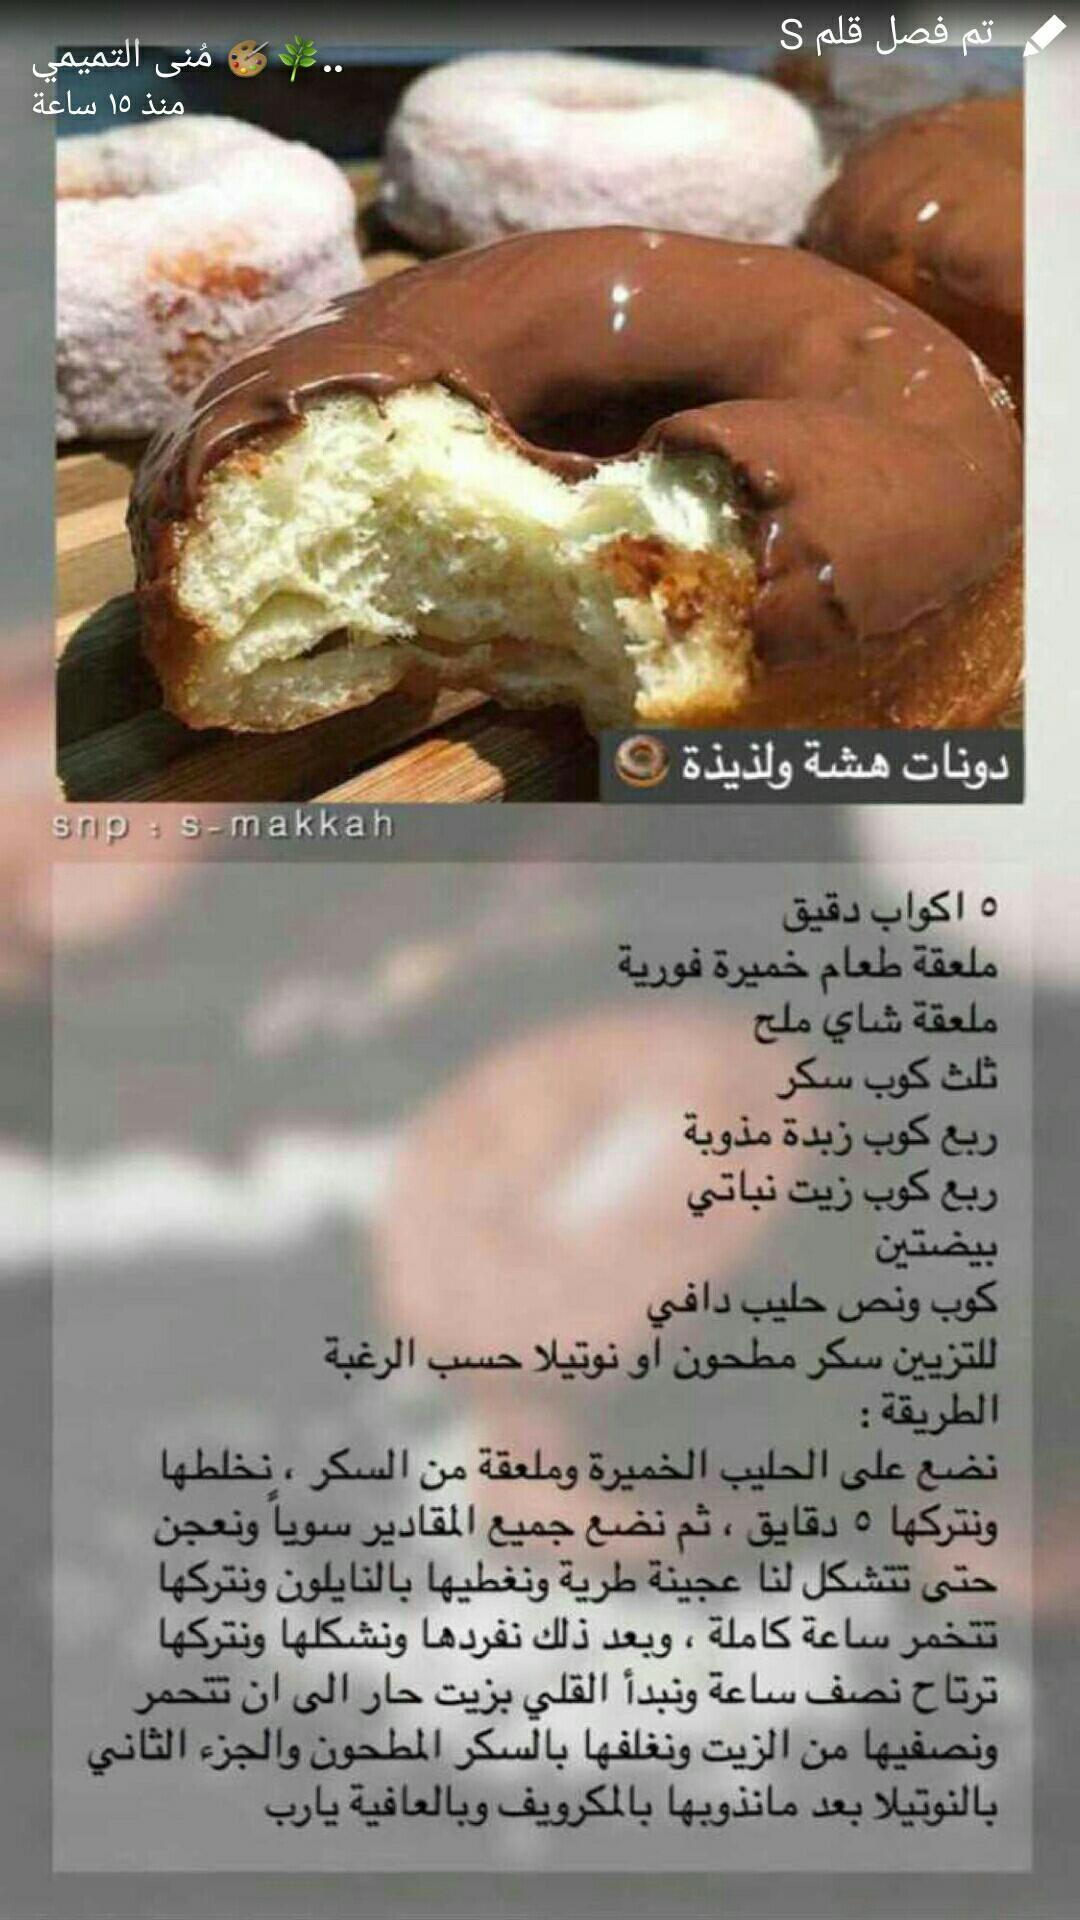 دونات هشه Cooking Recipes Desserts Save Food Food Receipes